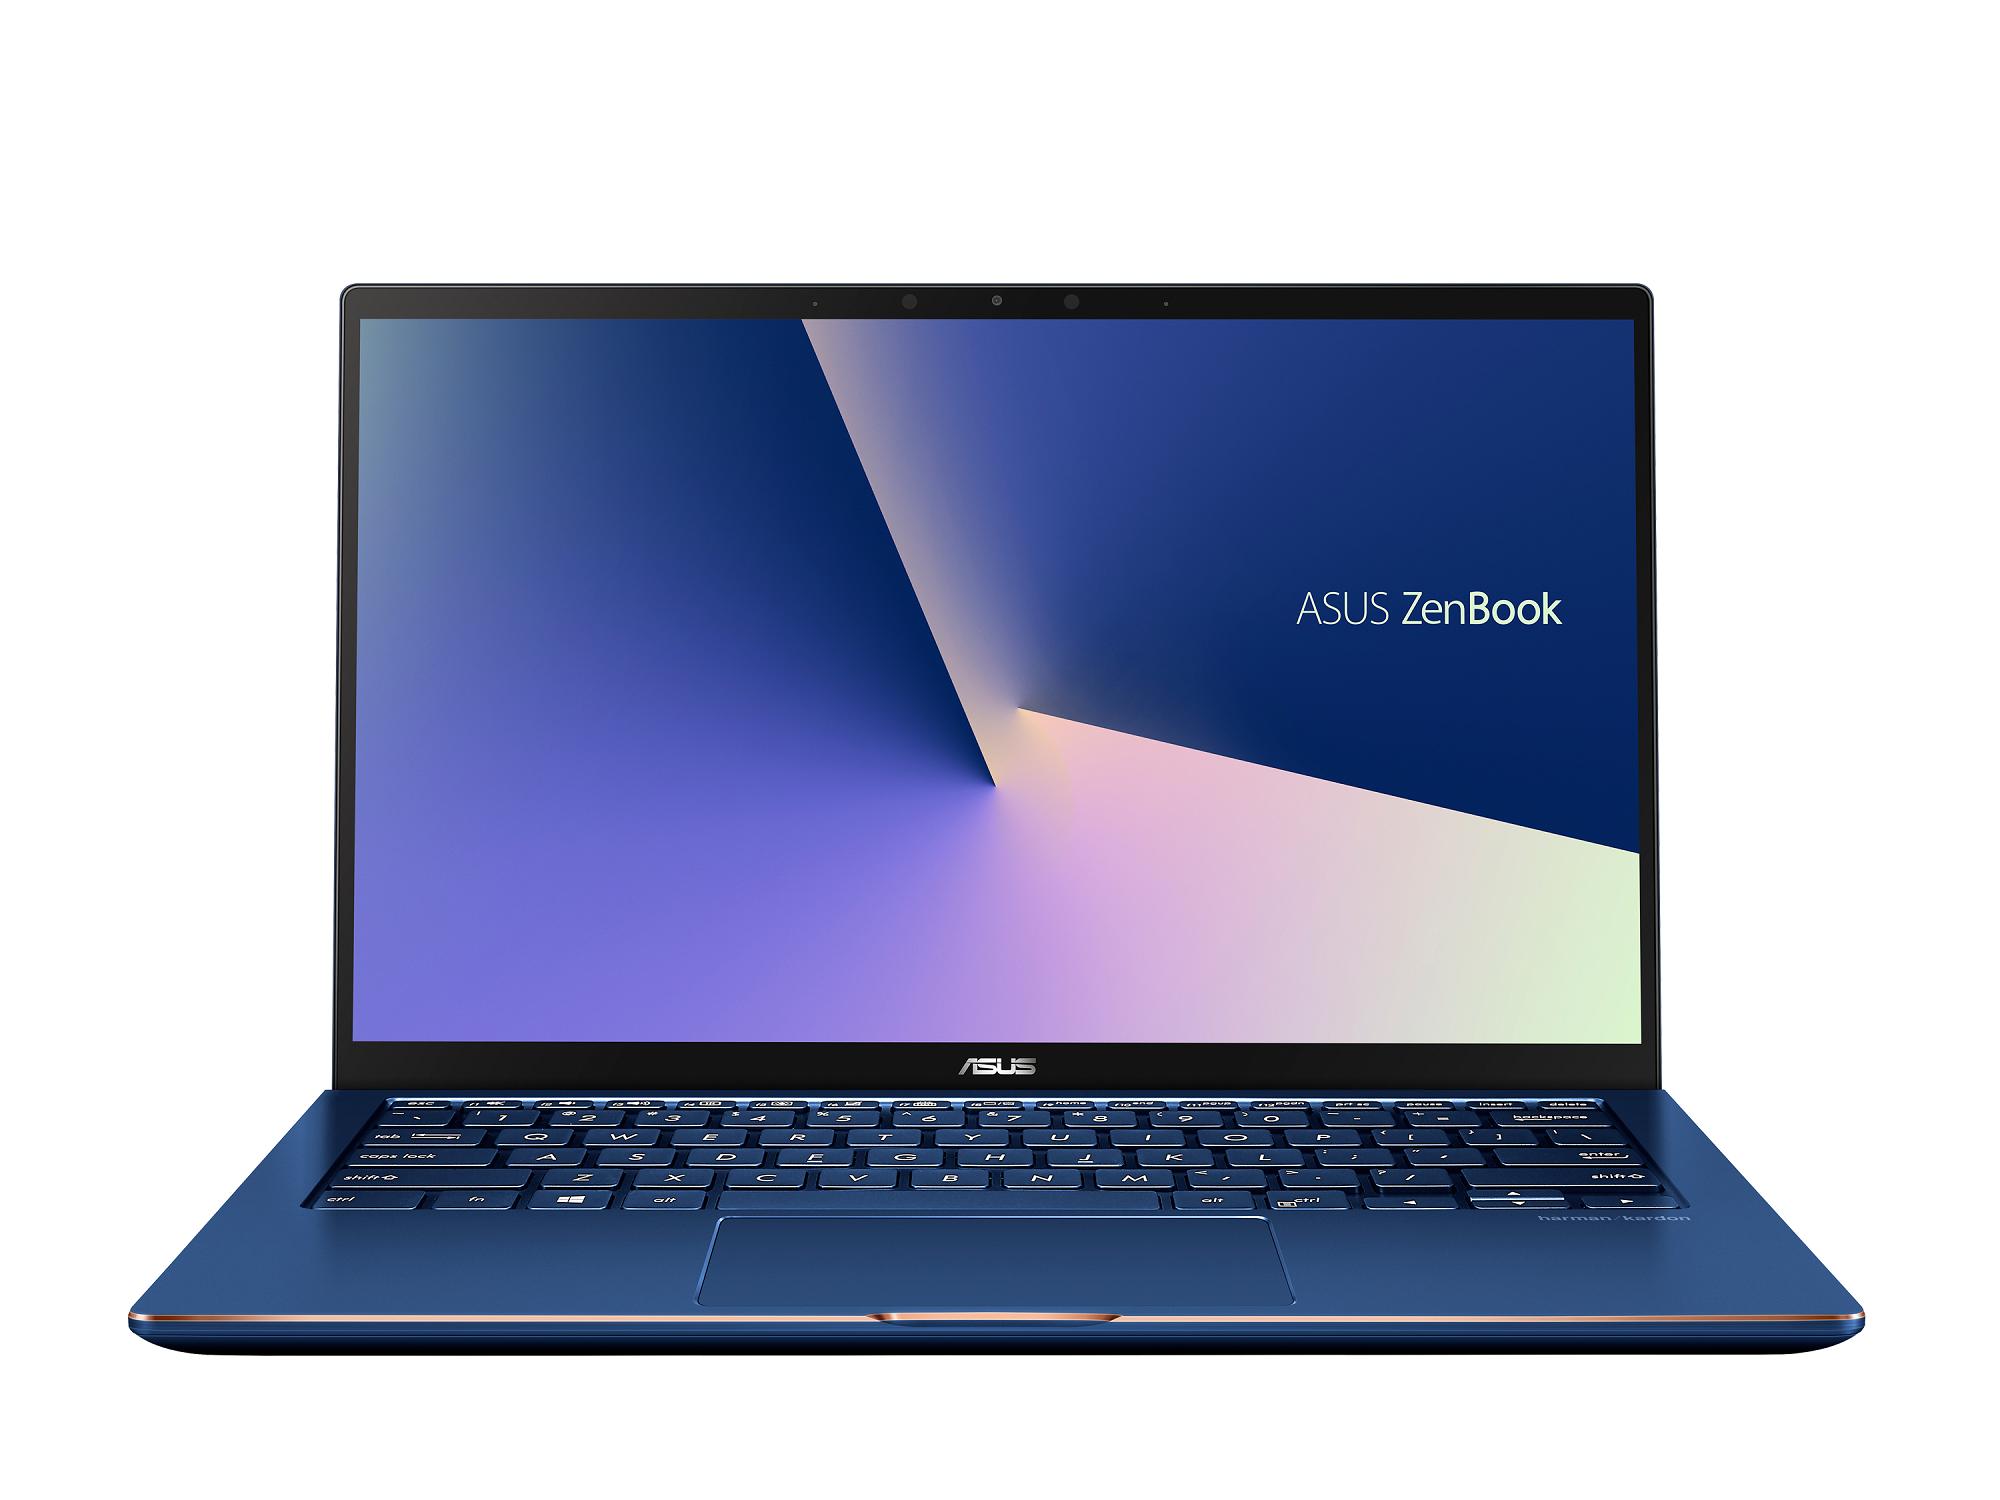 ASUS ZenBook Flip 13_UX362_Royal Blue_4-sided NanoEdge